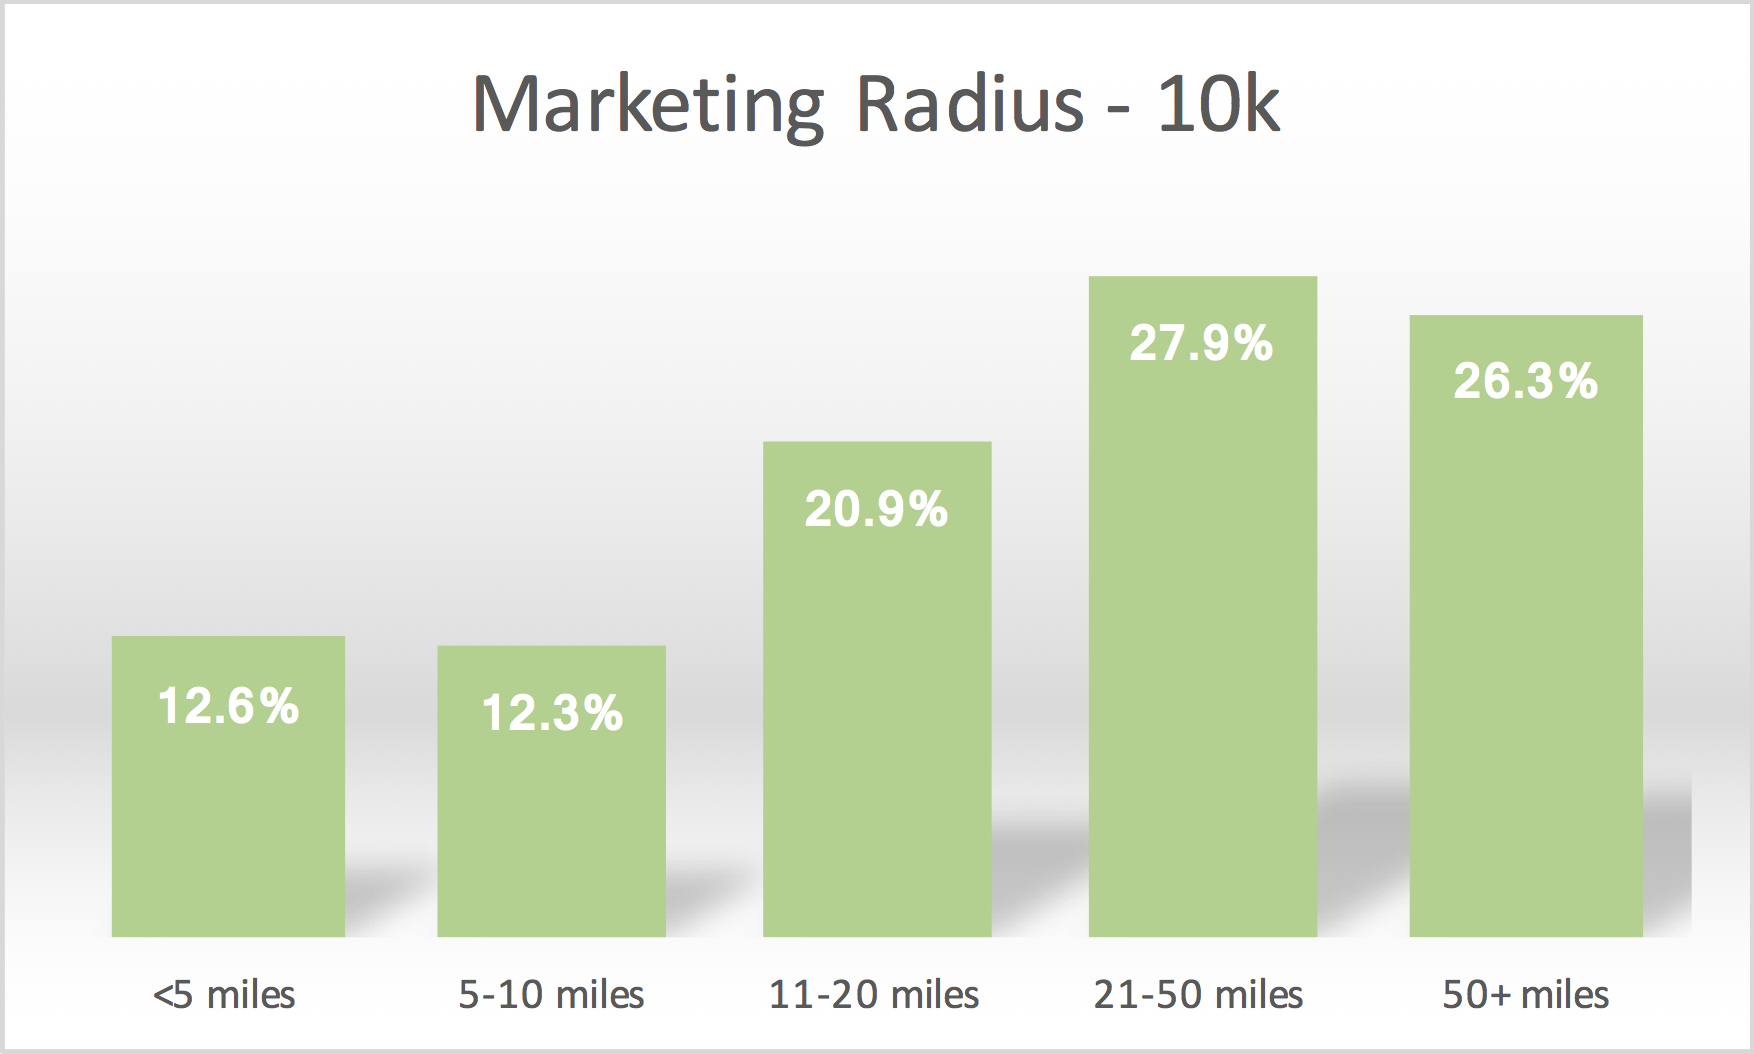 Marketing Radius - 10k